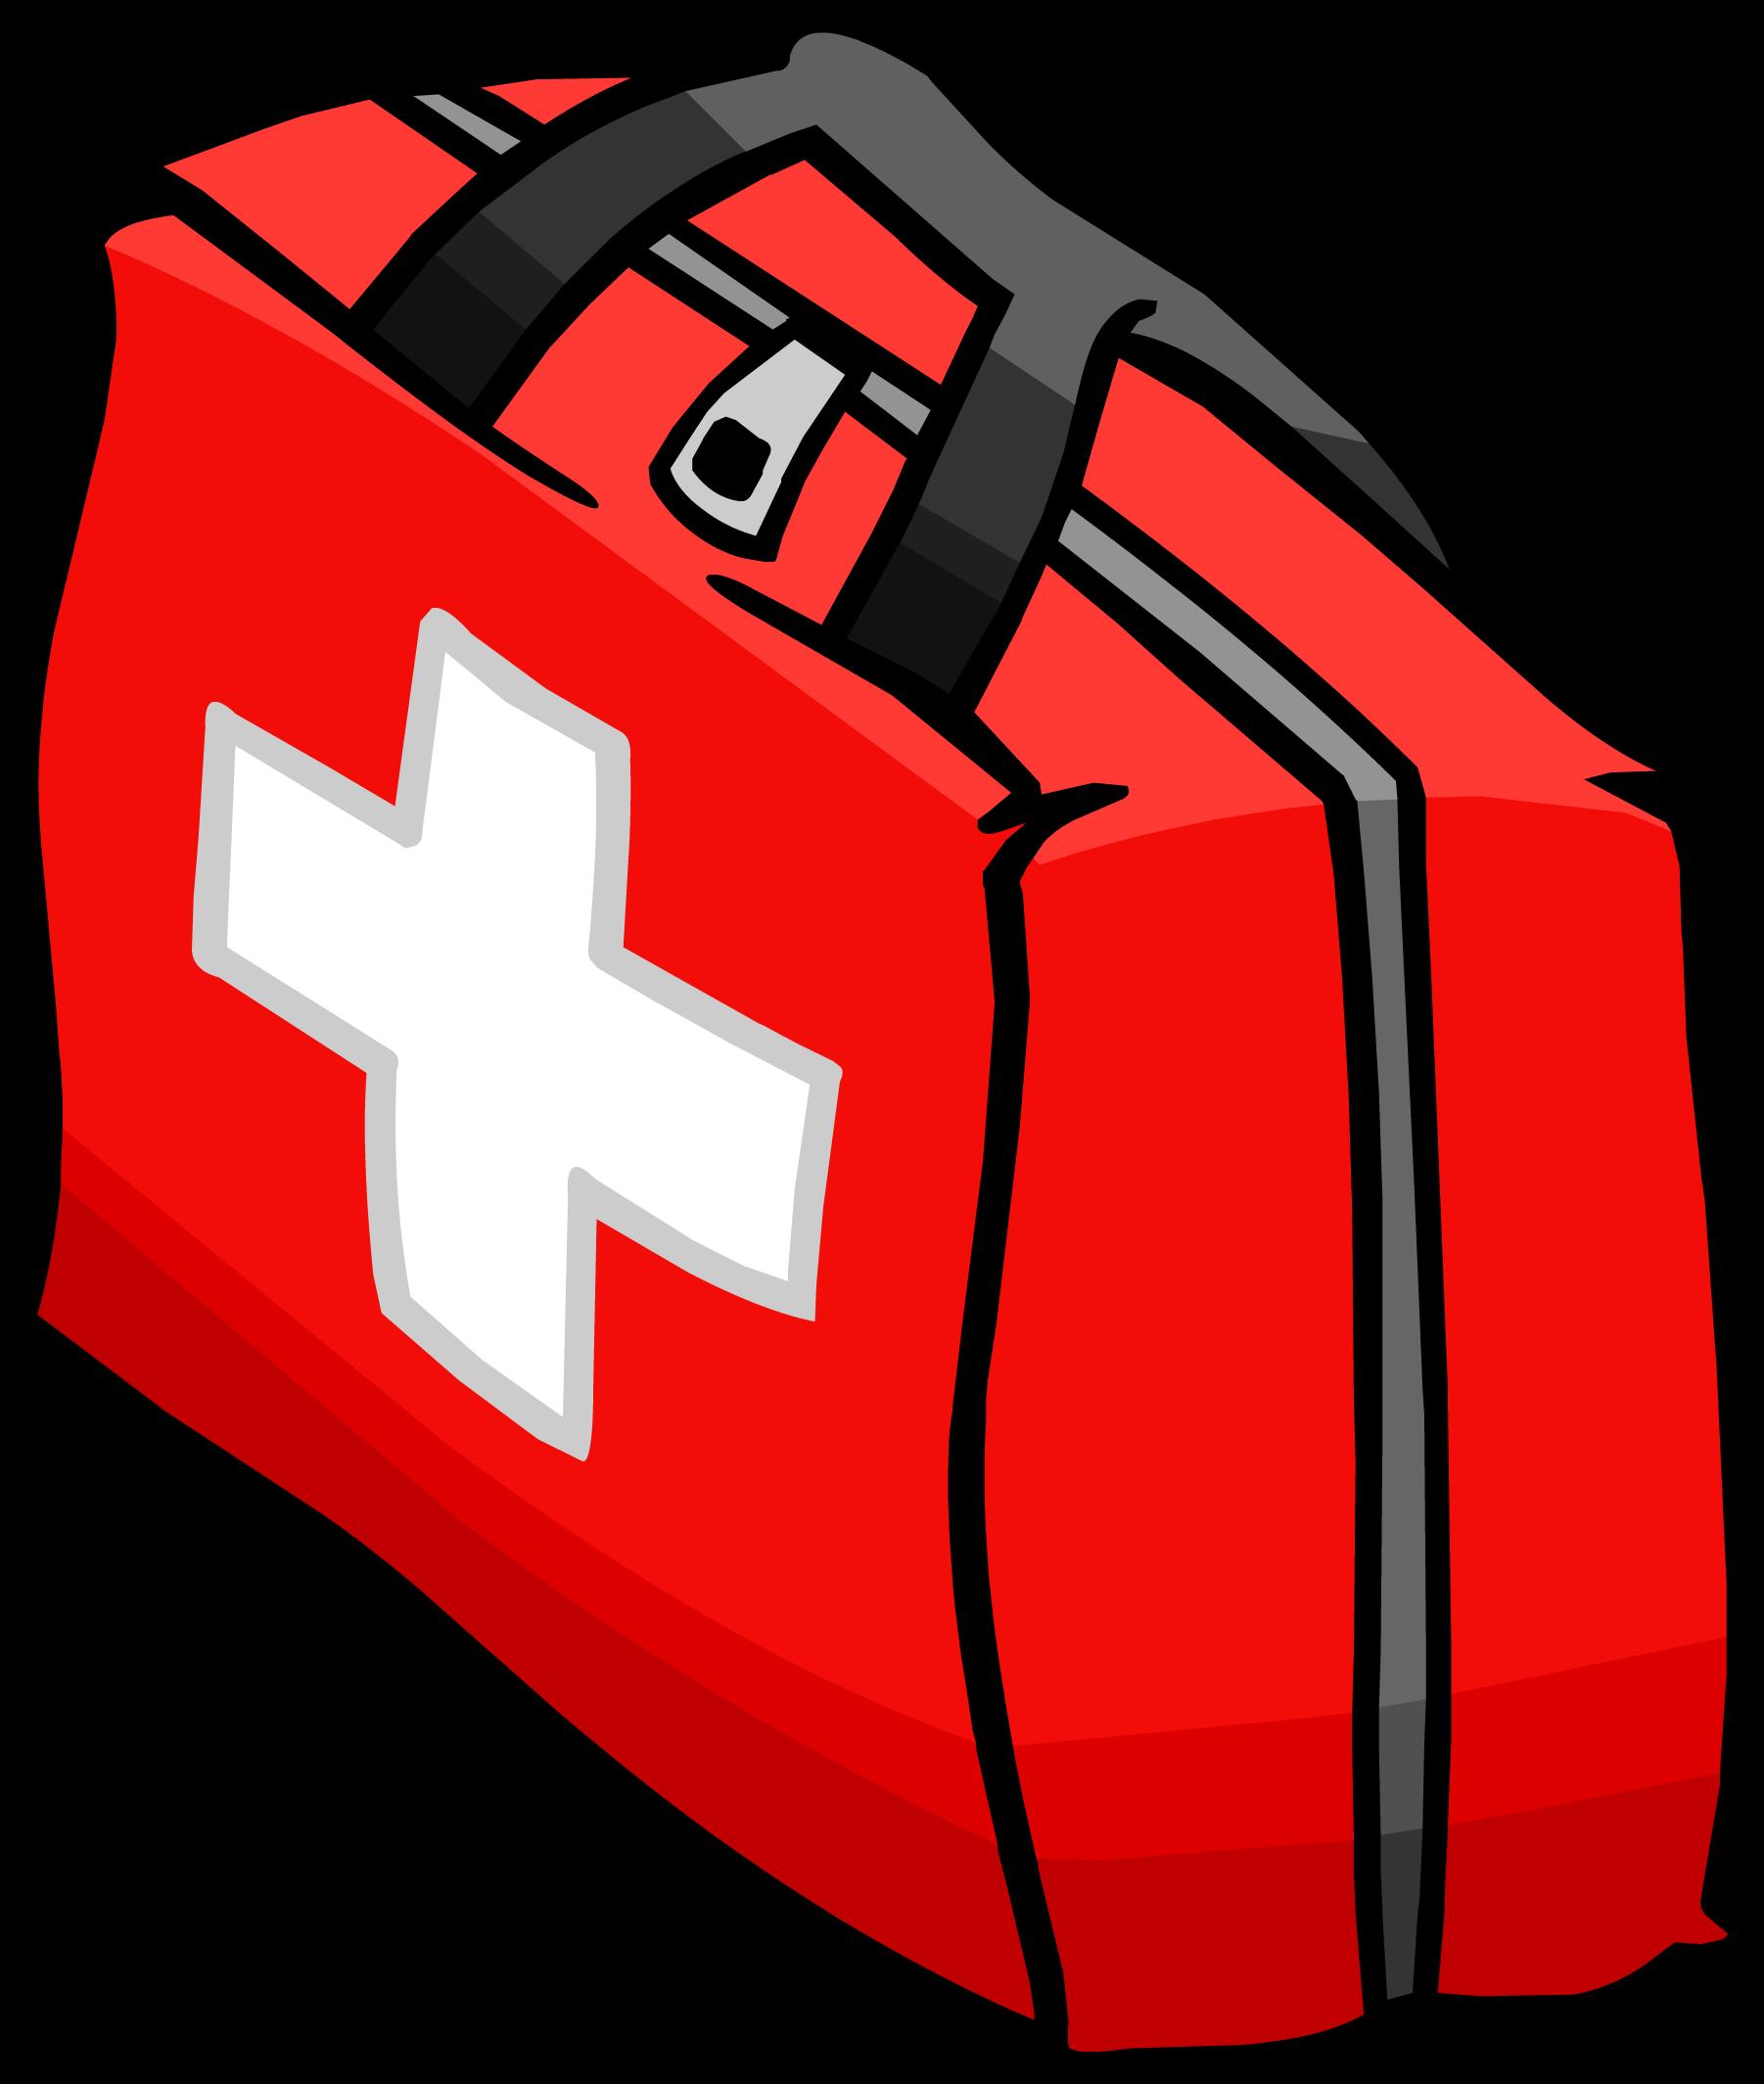 1802x2129 Bag Clipart Emergency Kit